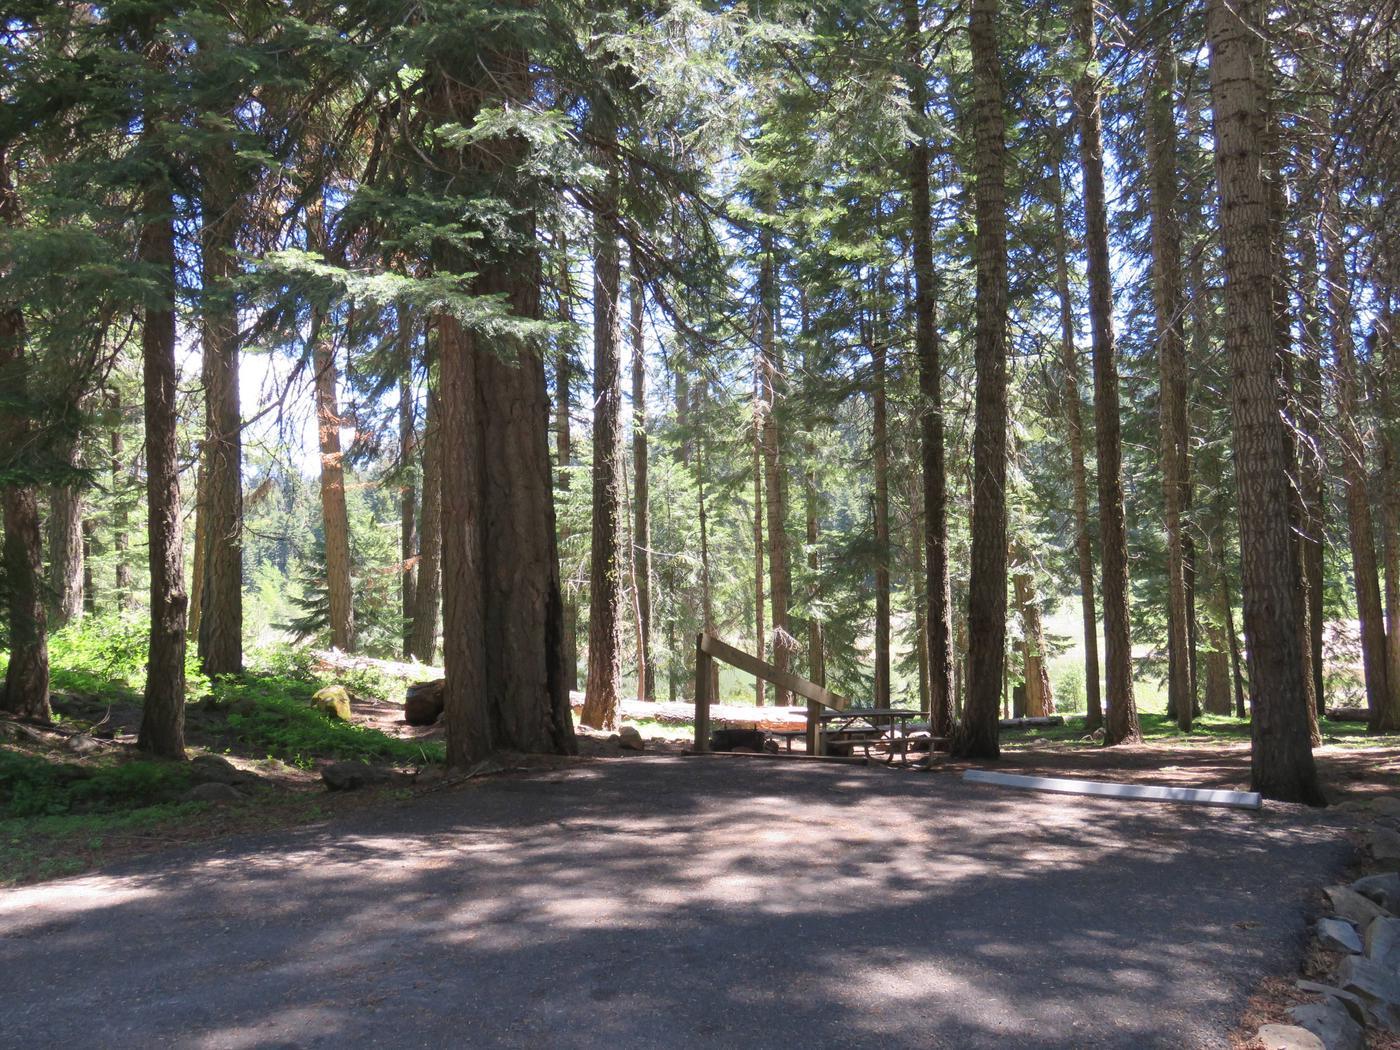 Hyatt Lake Recreation AreaHyatt Campsite